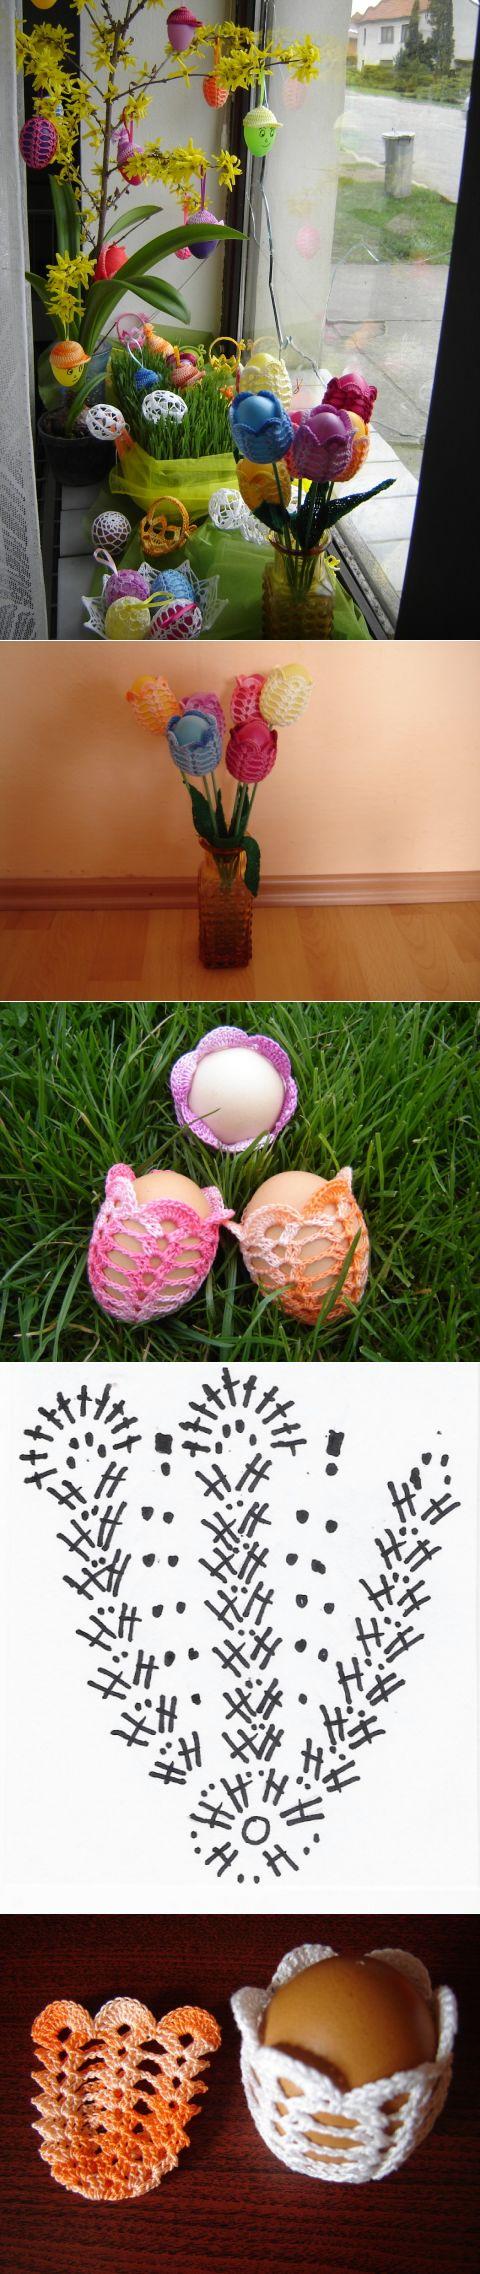 Пасхальные яйца ТЮЛЬПАНЫ. Вязание крючком